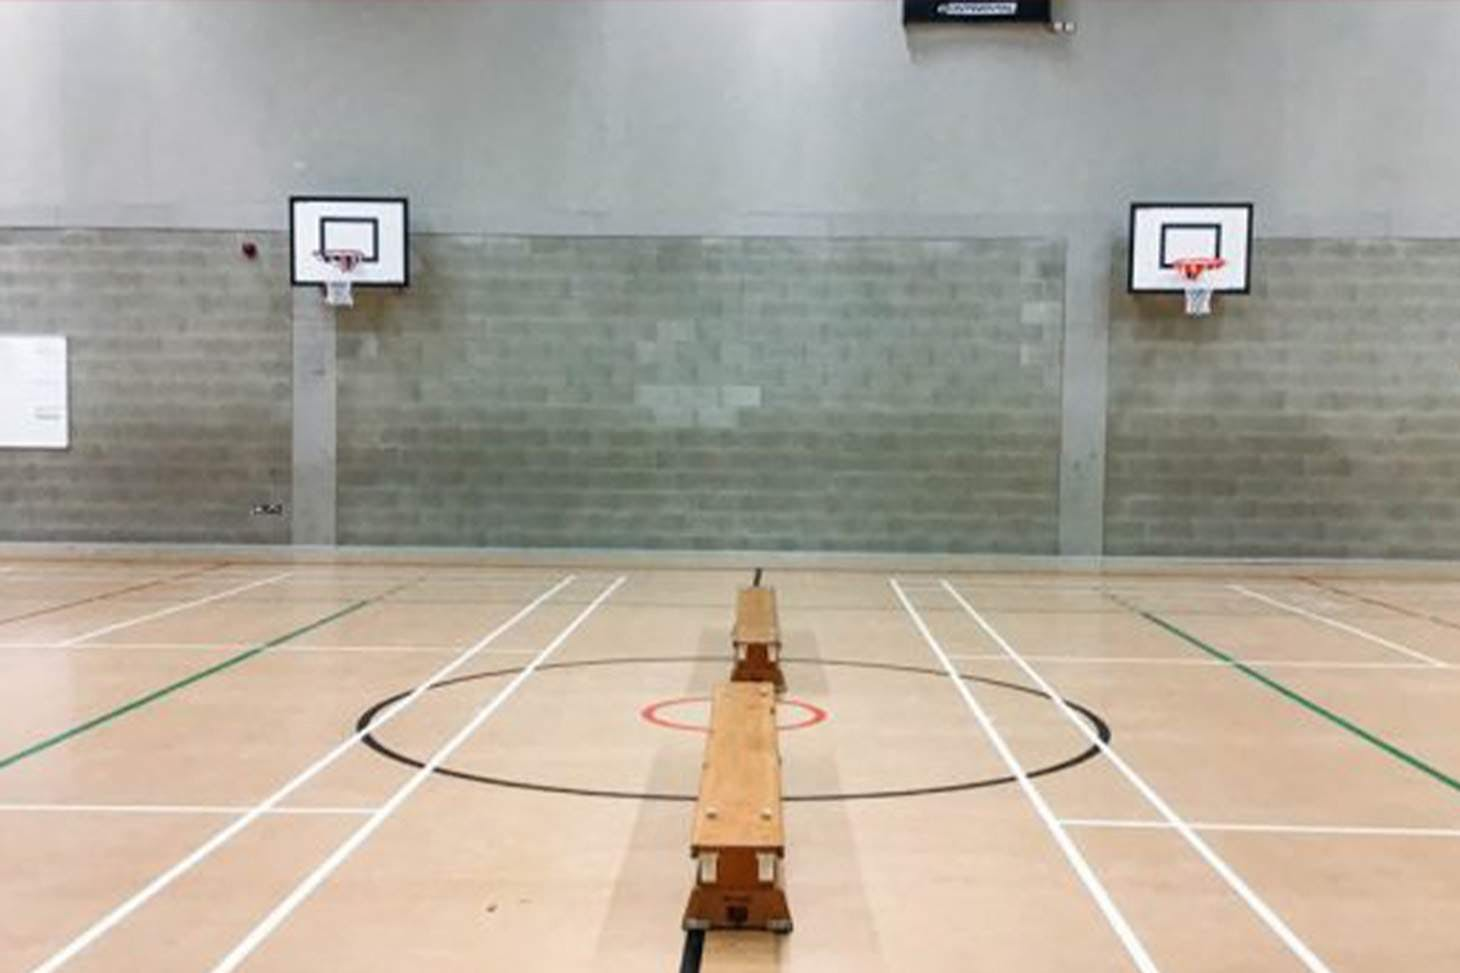 East Barnet School Court | Sports hall netball court